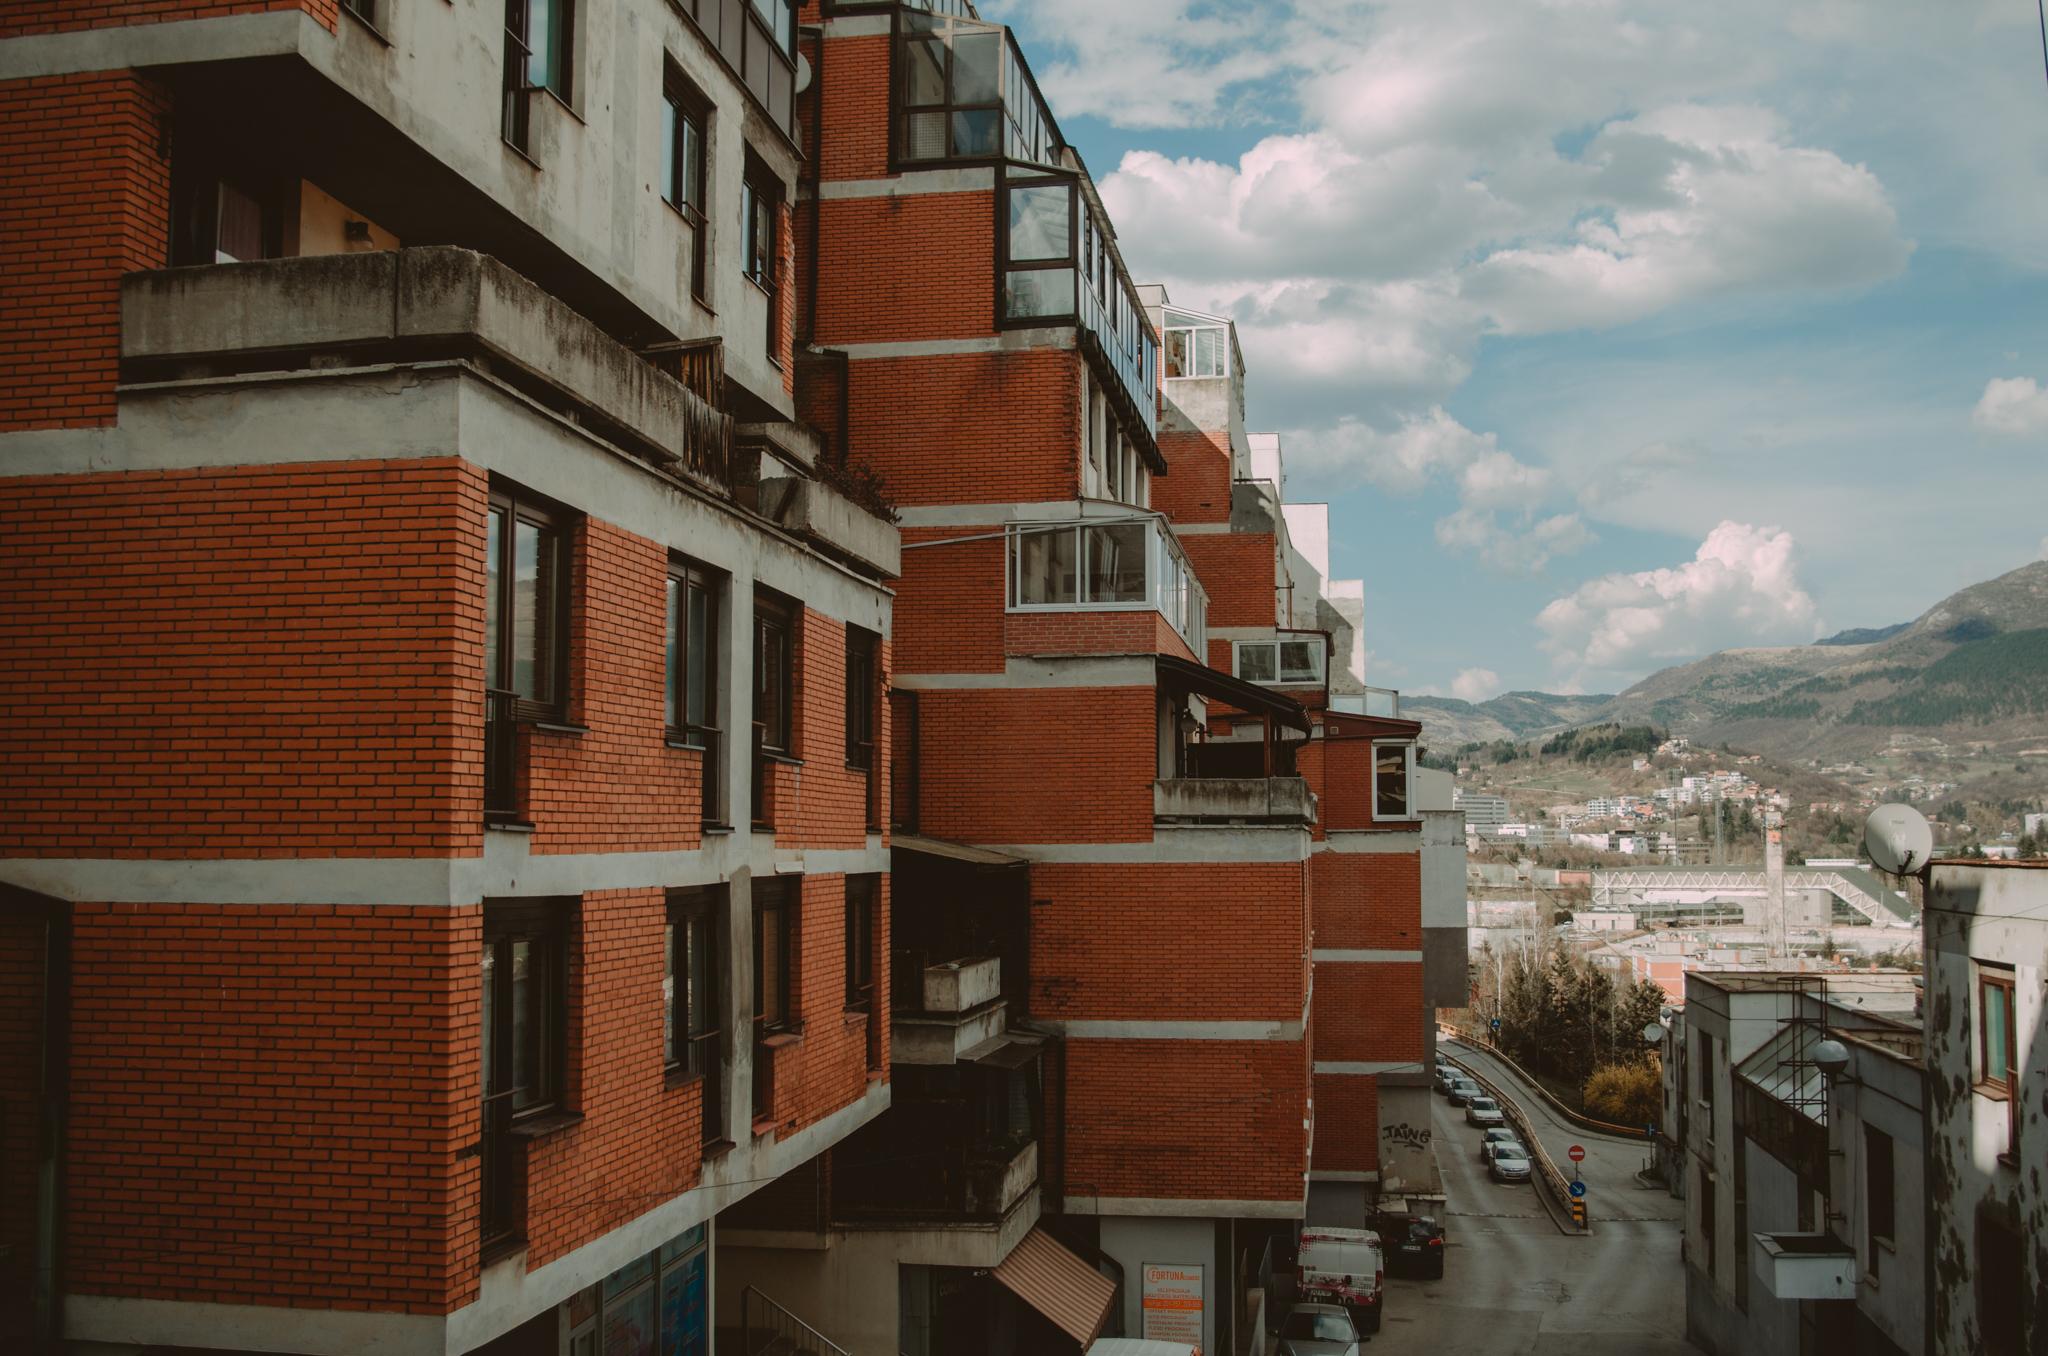 ciglane-sarajewo-punkty-widokowe-panorama